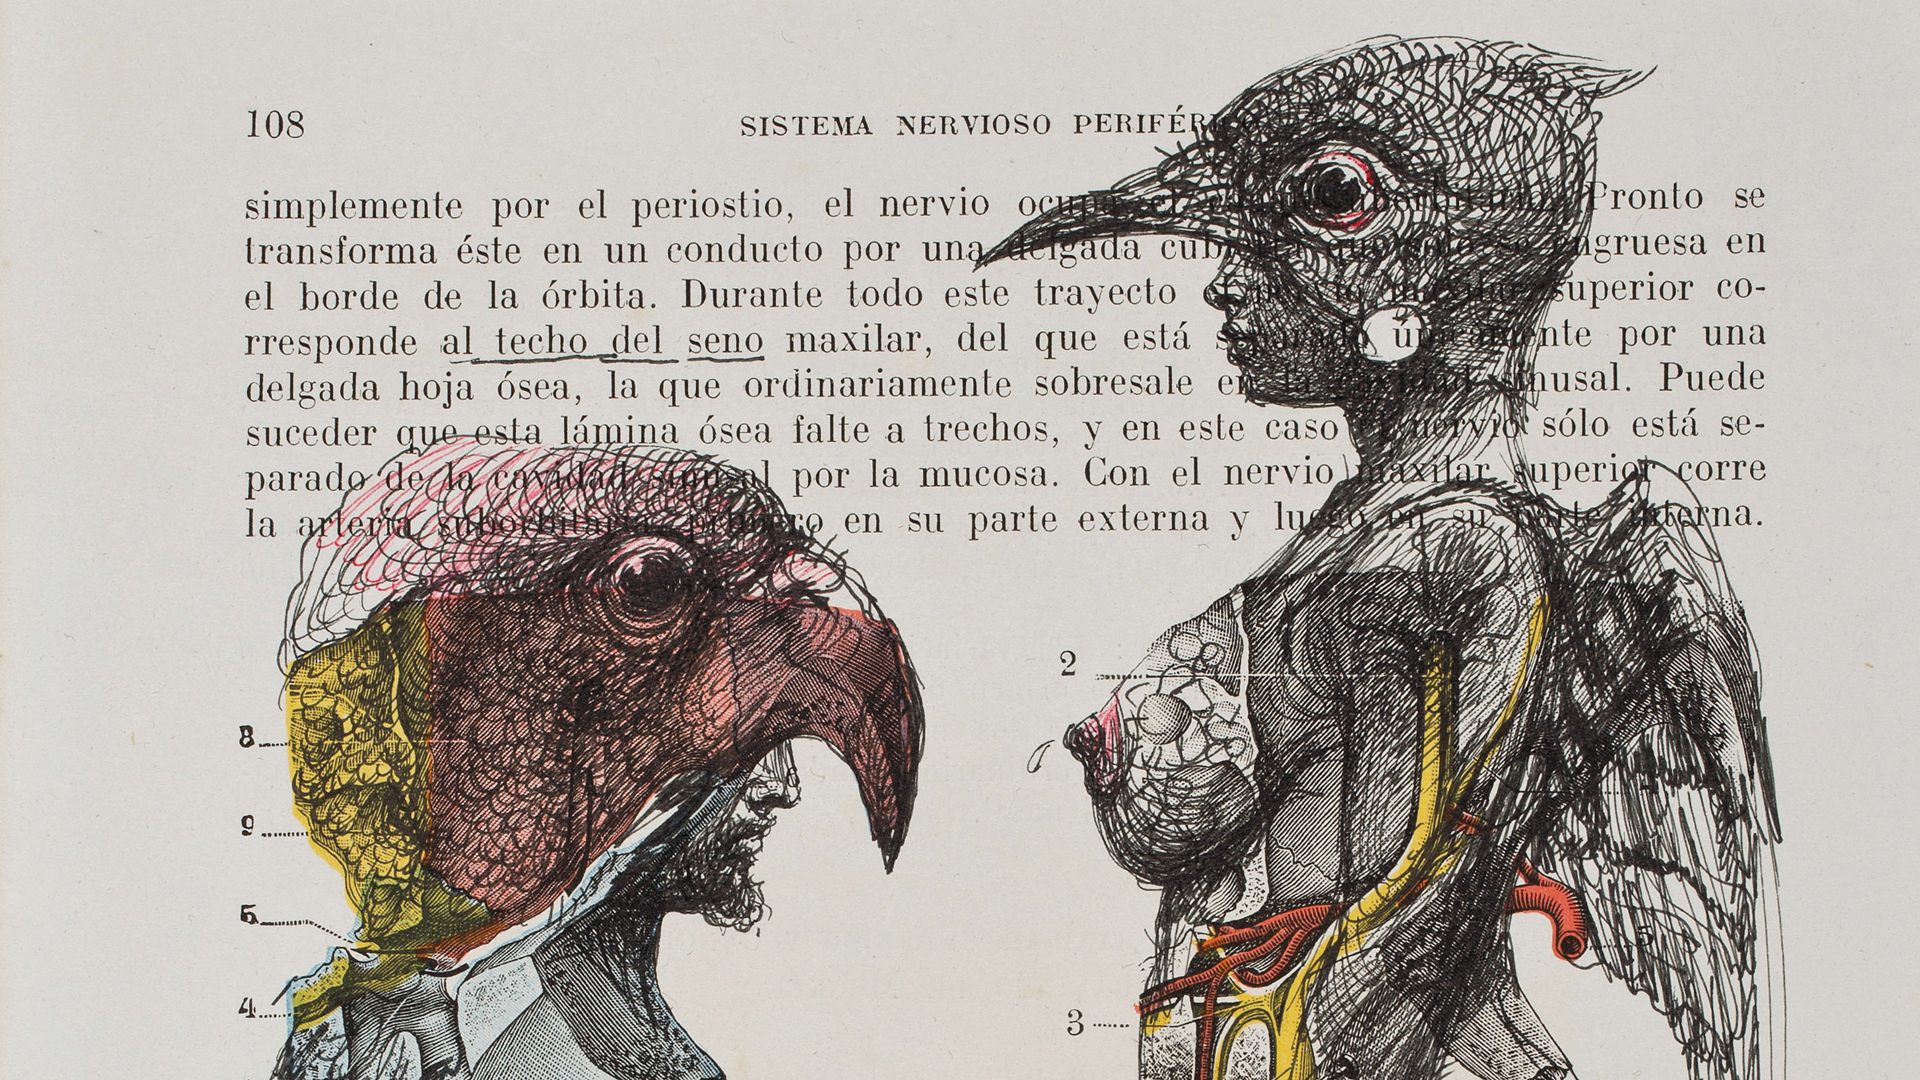 Roberto Fabelo (Cuba, b. 1951), Al techo del seno / At the   Breast's Celling  , 2013 Mixed media on paper. 6 1/2 x 9 3/4 in.Courtesy of the artist.